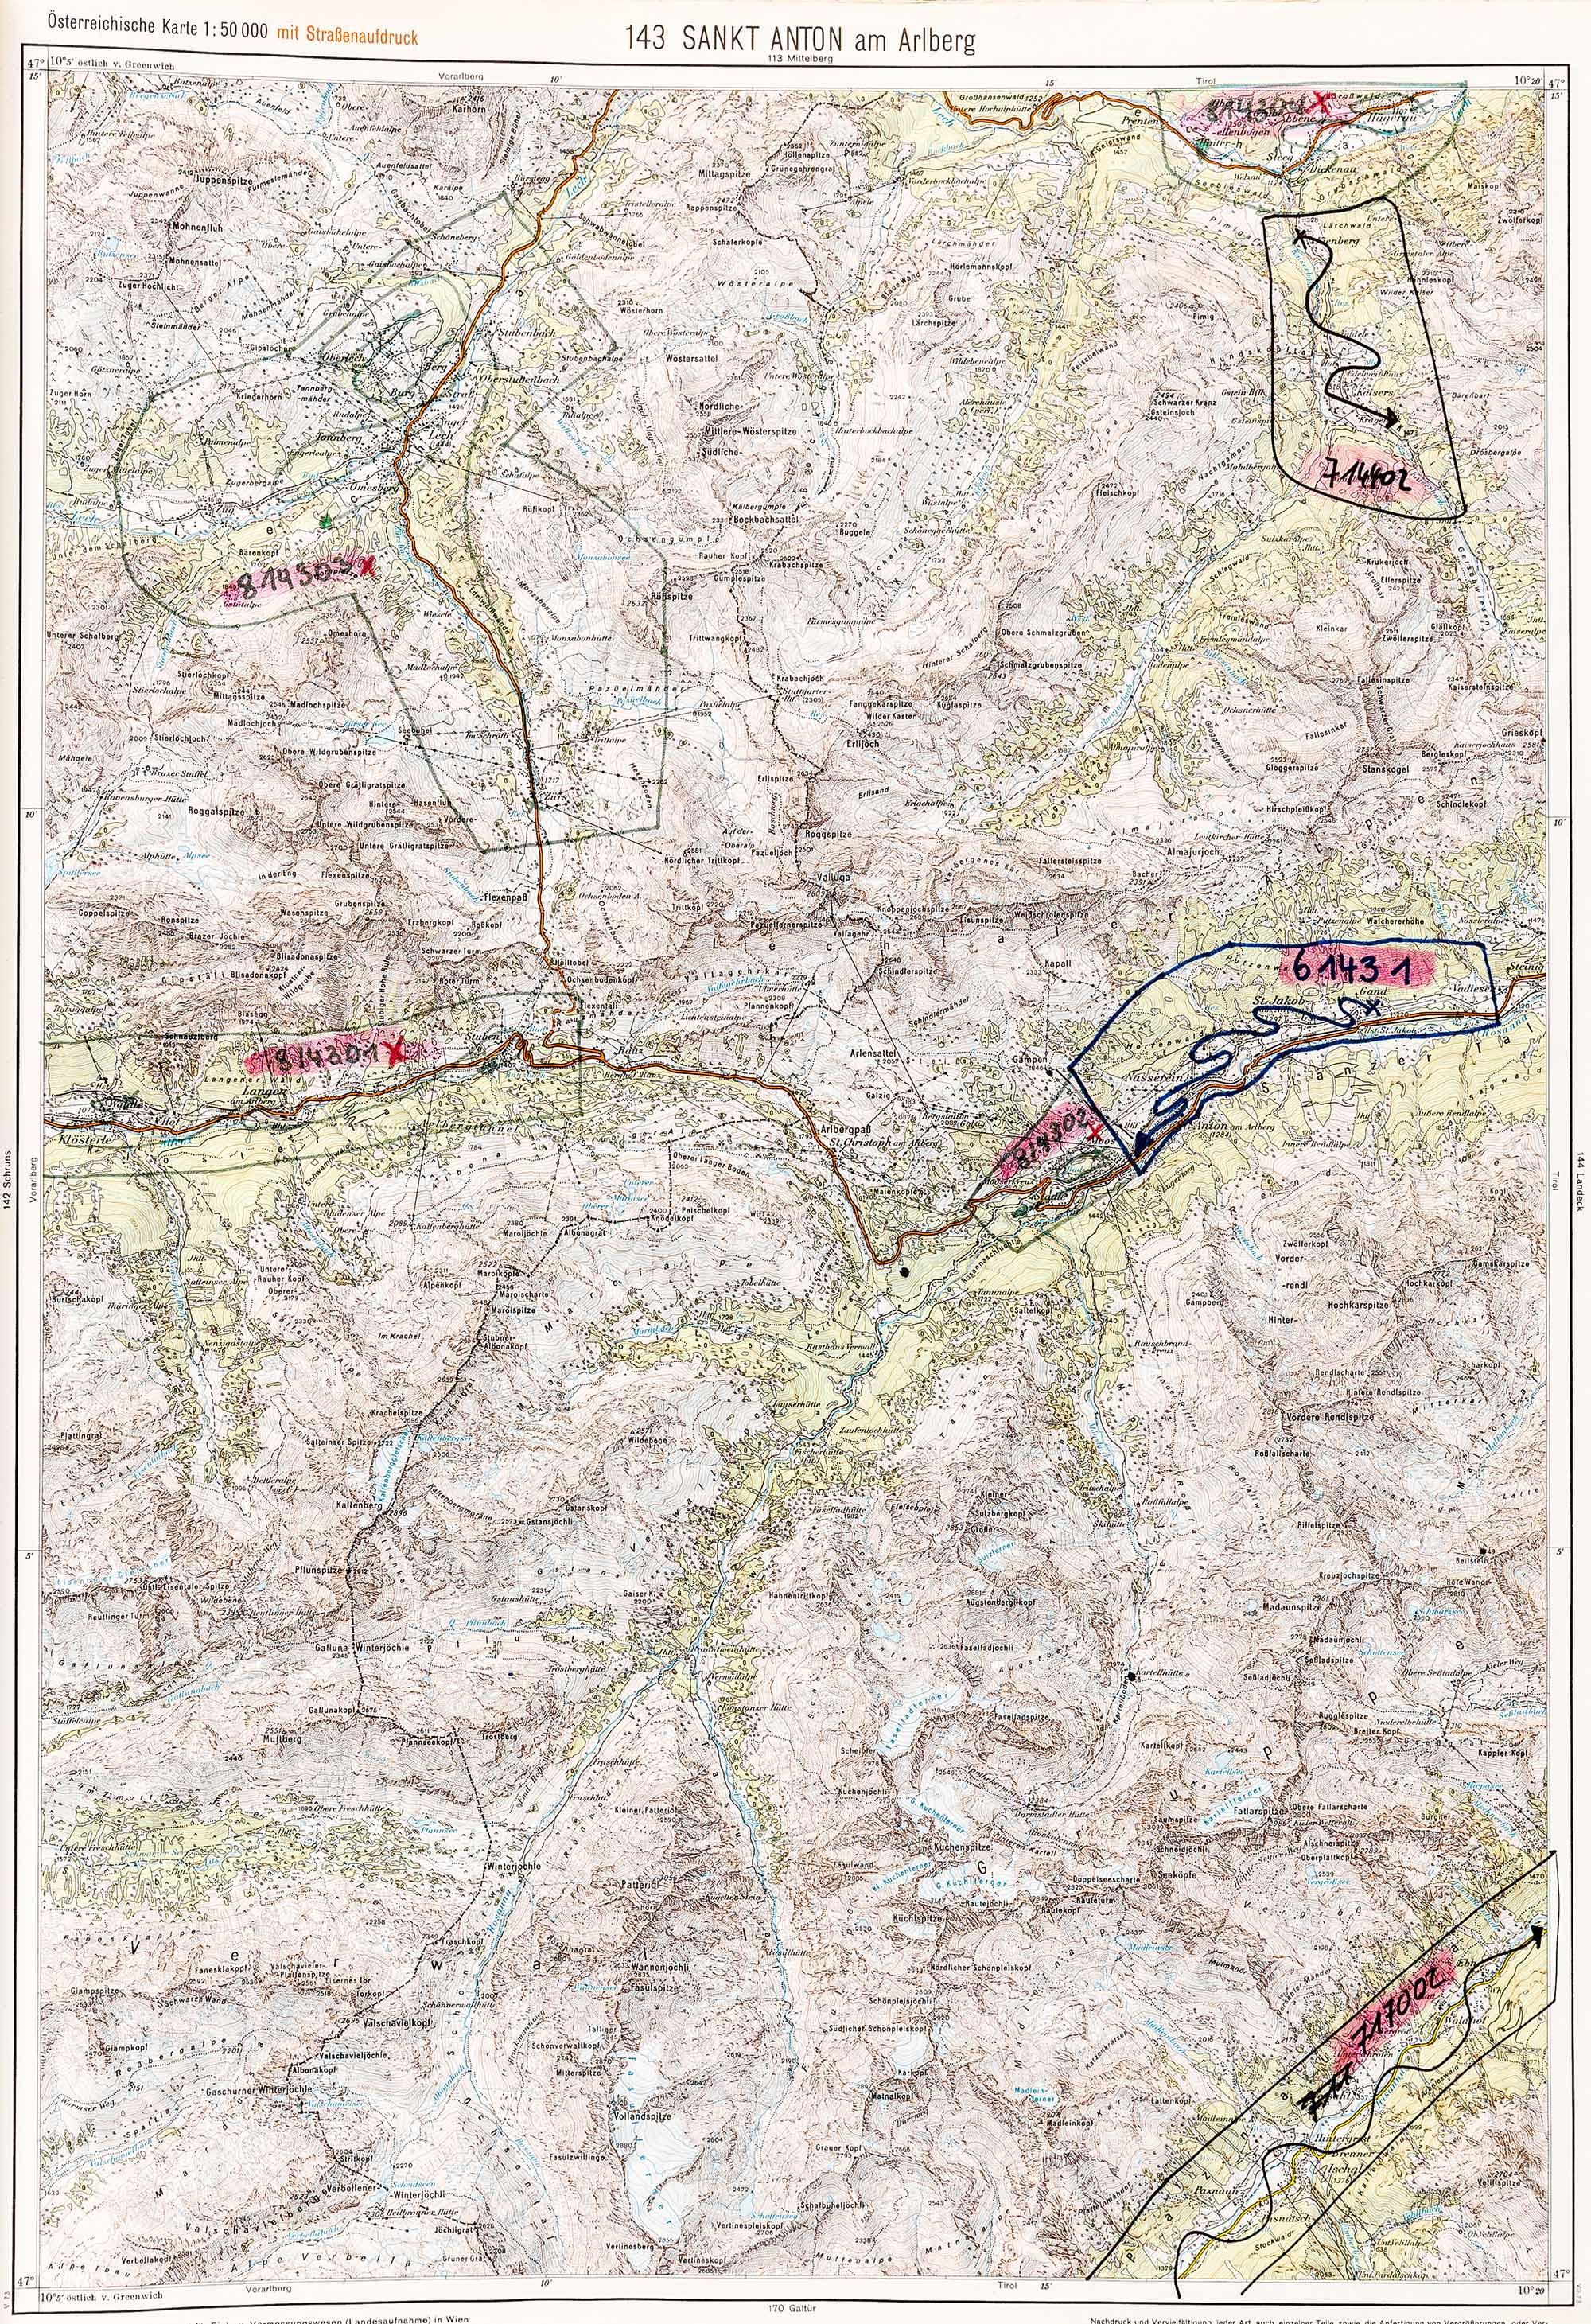 1975-1979 Karte 143